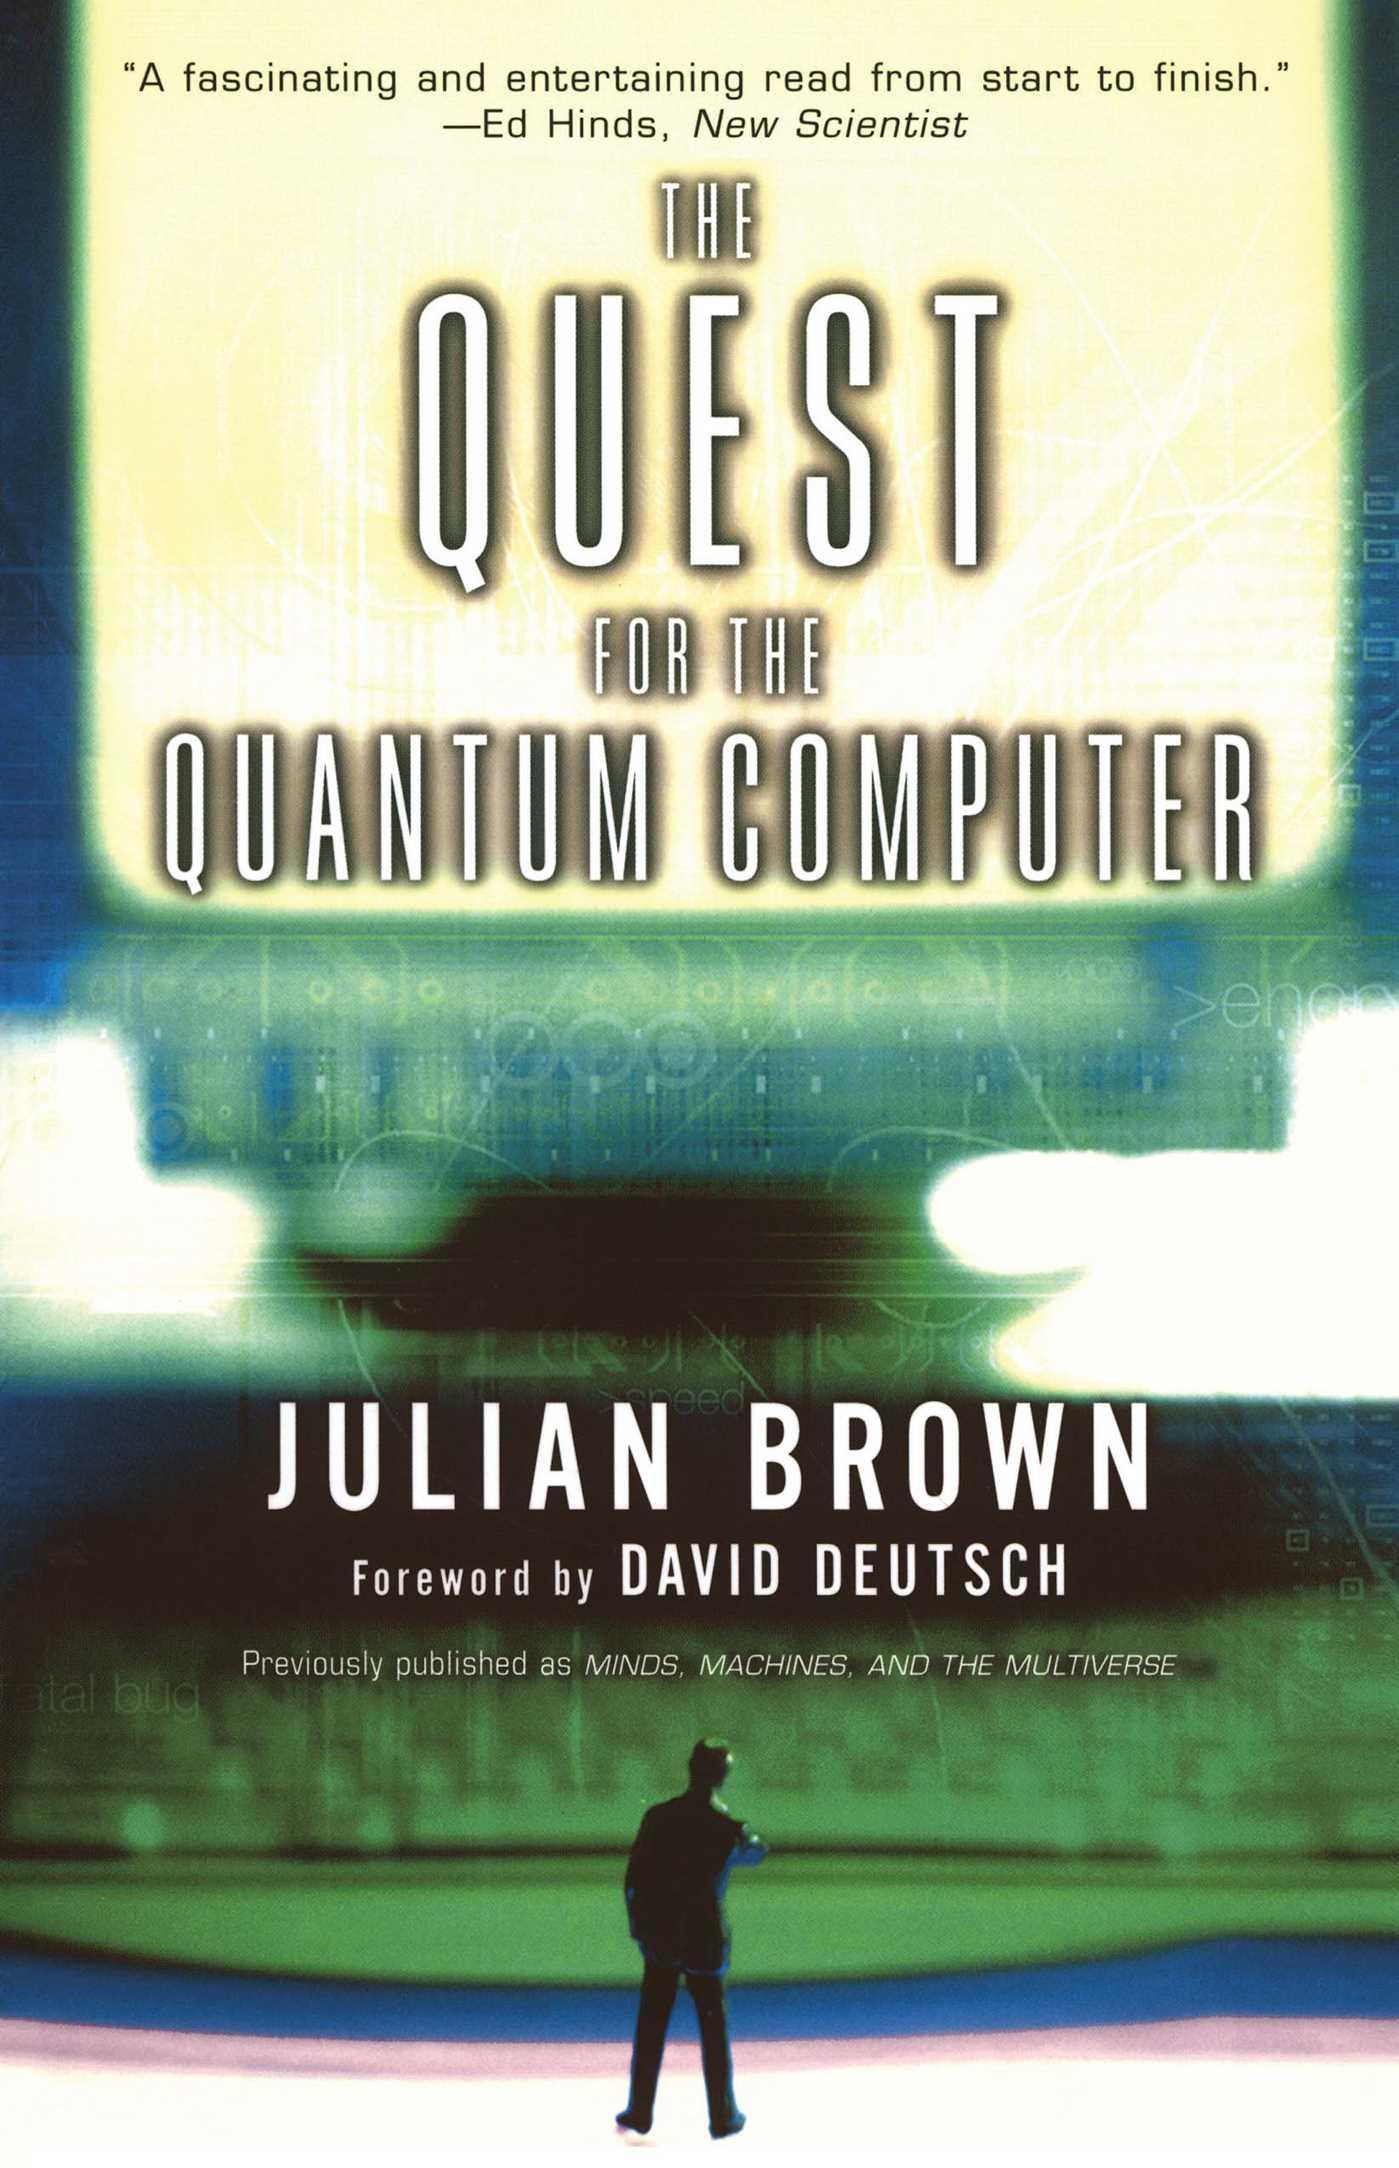 Quest for the quantum computer 9780684870045 hr